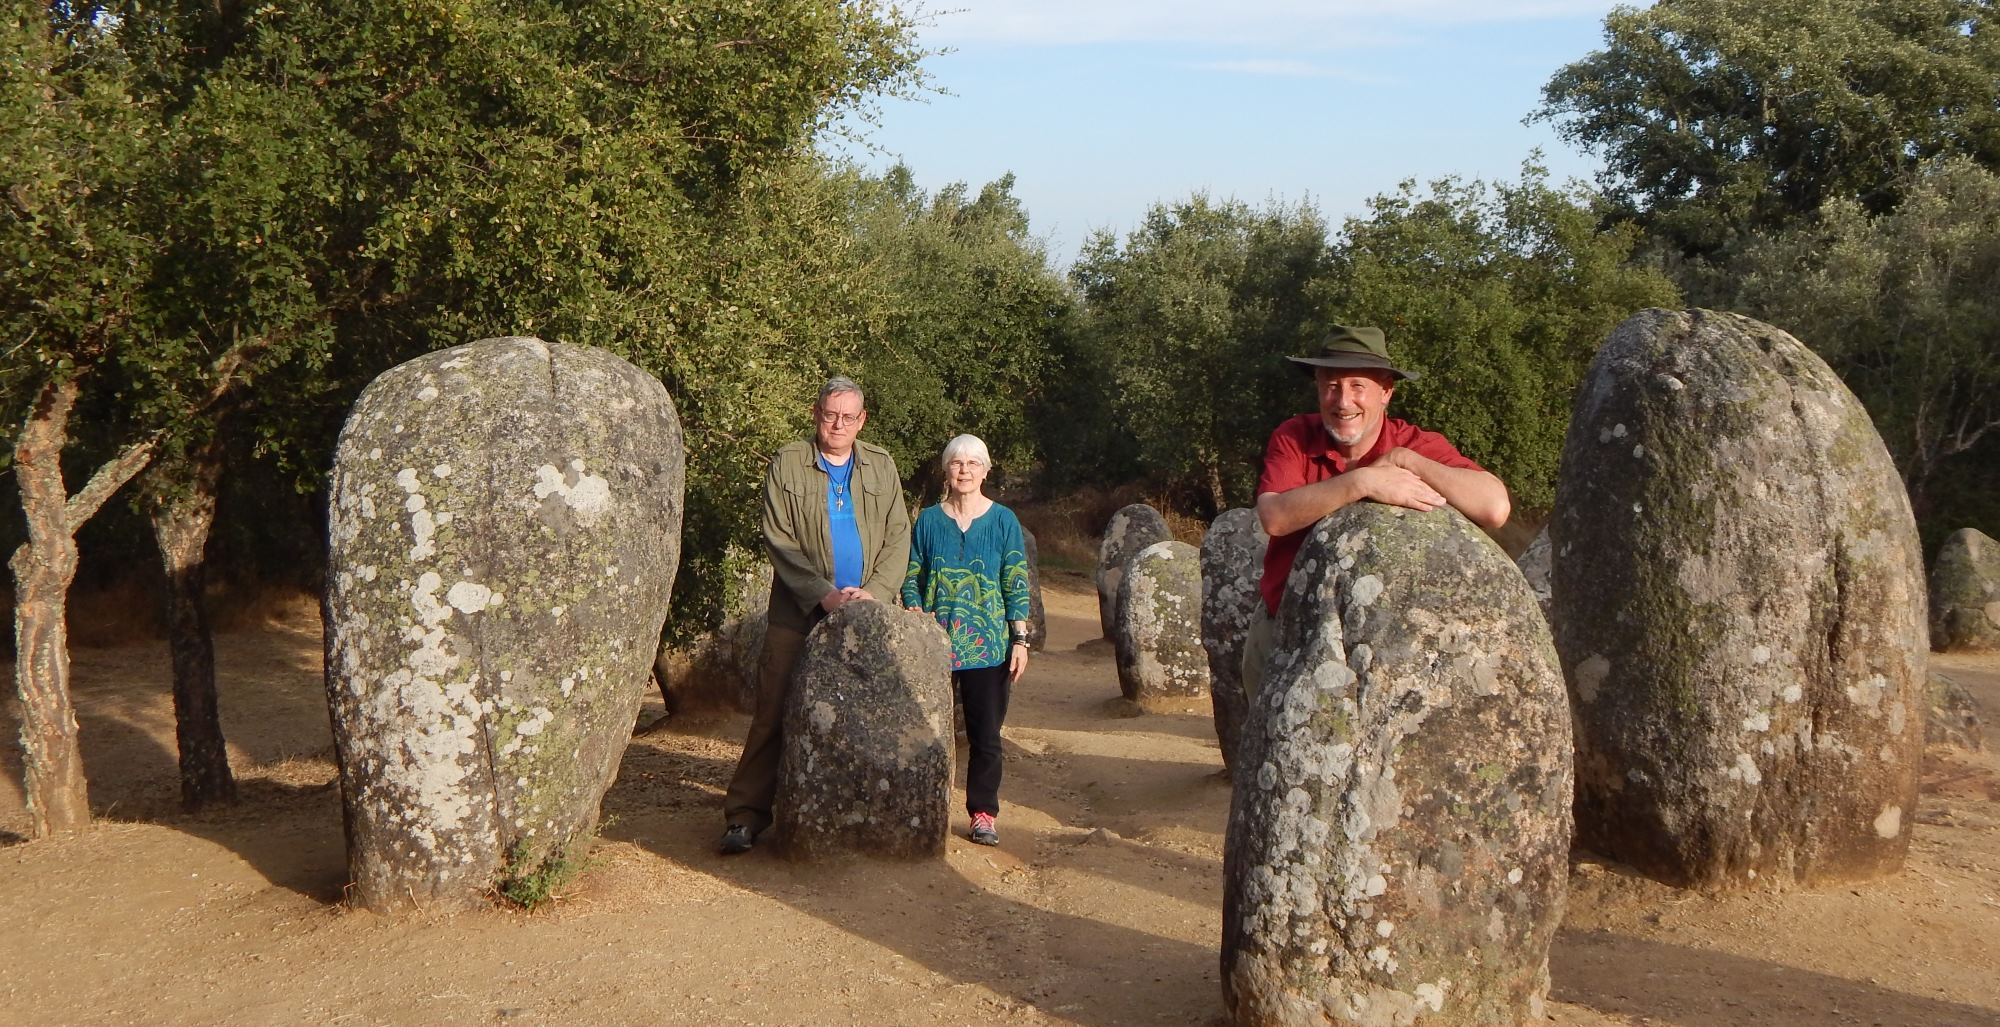 Sacred Landscapes Team - Ted Carter, Calen Rayne, Jini Rayne